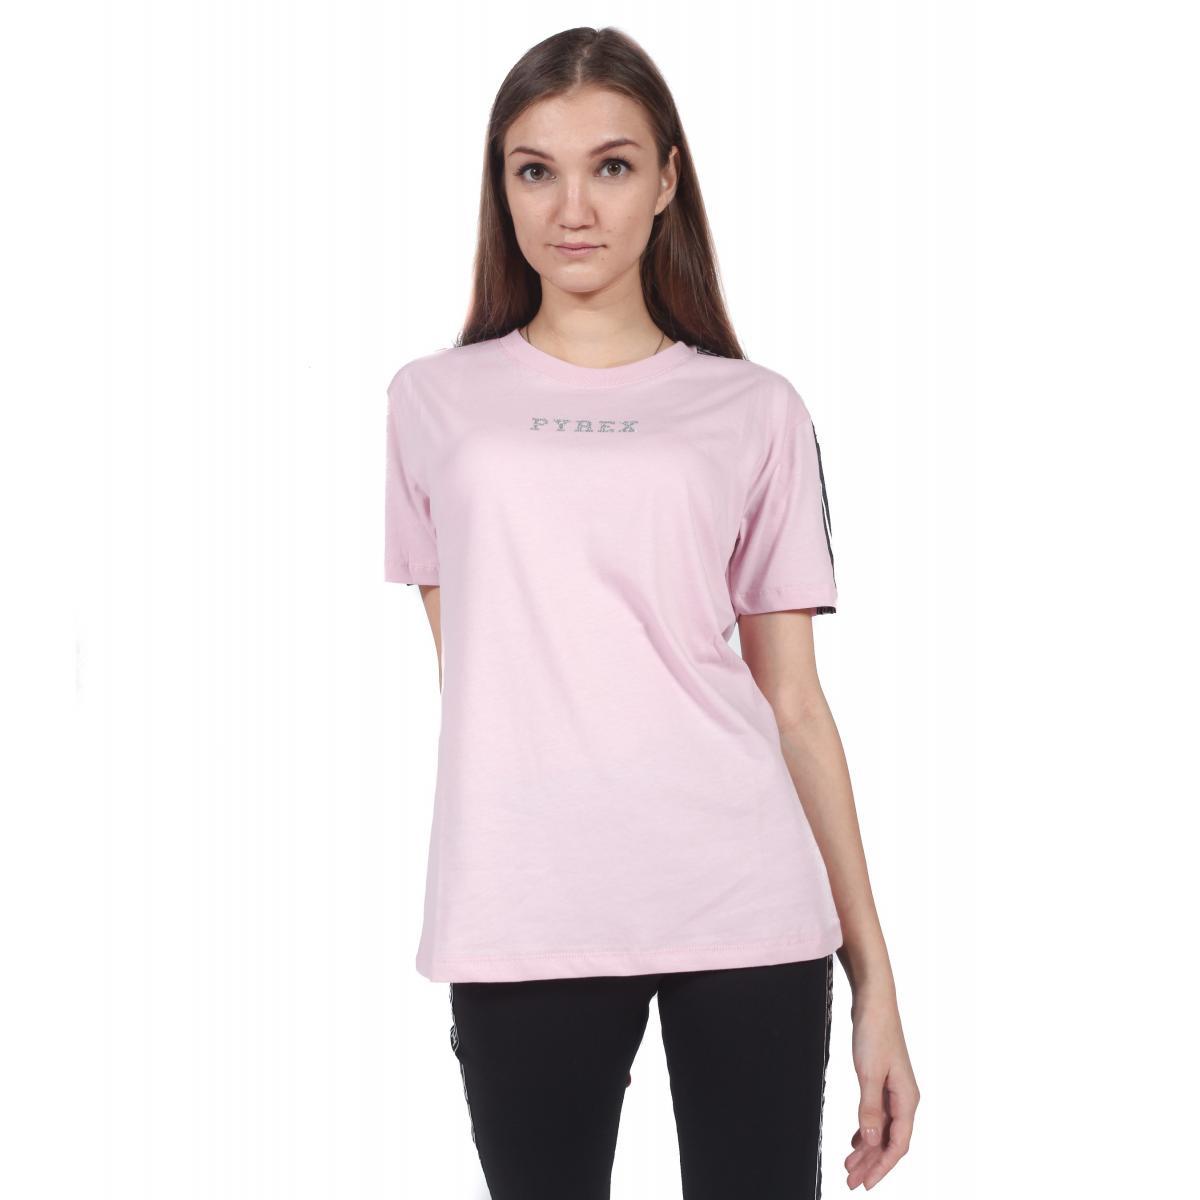 T-Shirt Maglia Pyrex con logo da donna rif. 18IPC34408